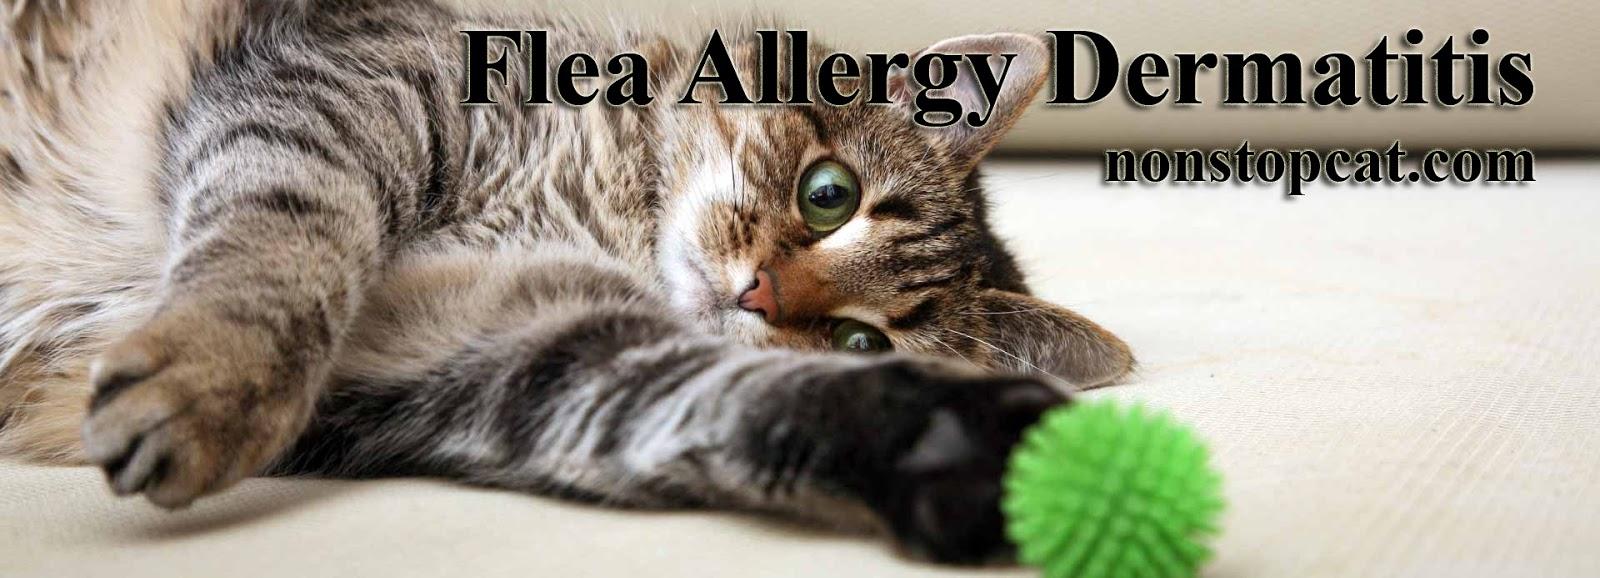 Flea Allergy Dermatitis